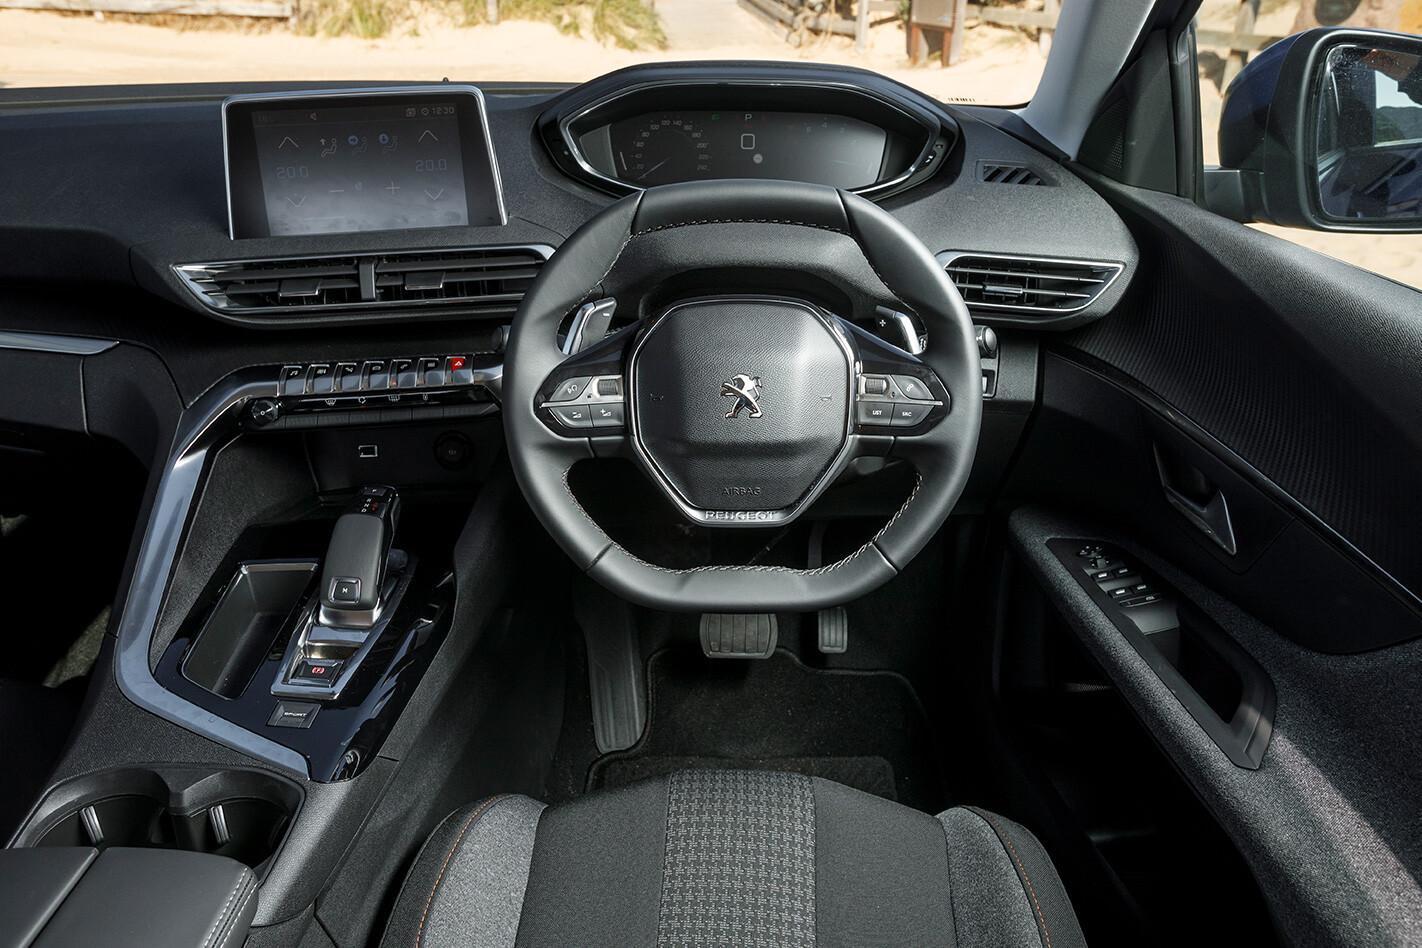 Suv Comparison Peugeot Up Close Jpg